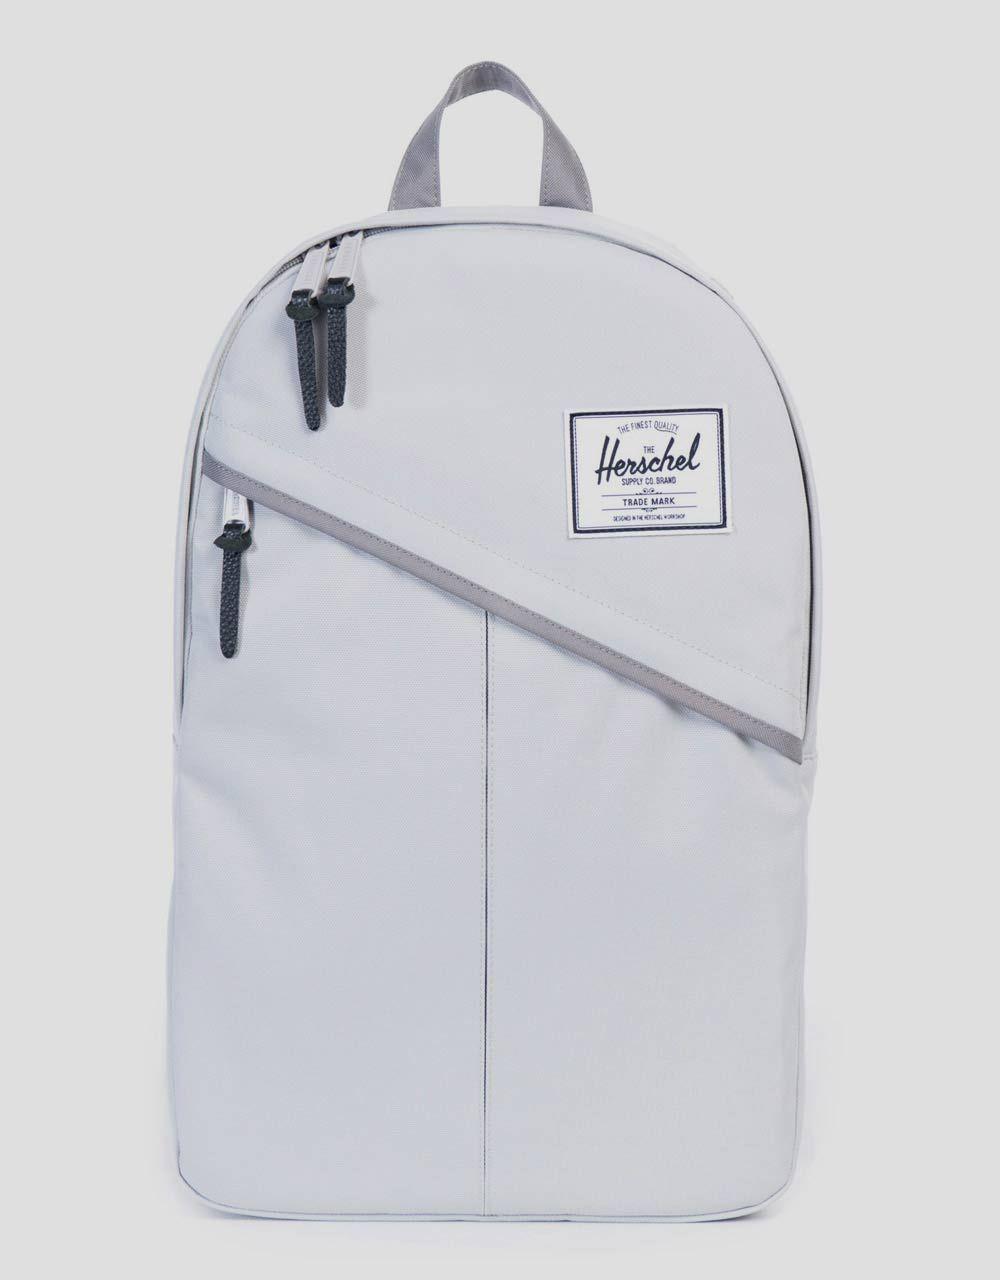 Herschel Supply Co. Parker Backpack - Lunar Rock Grey - RouteOne.co.uk